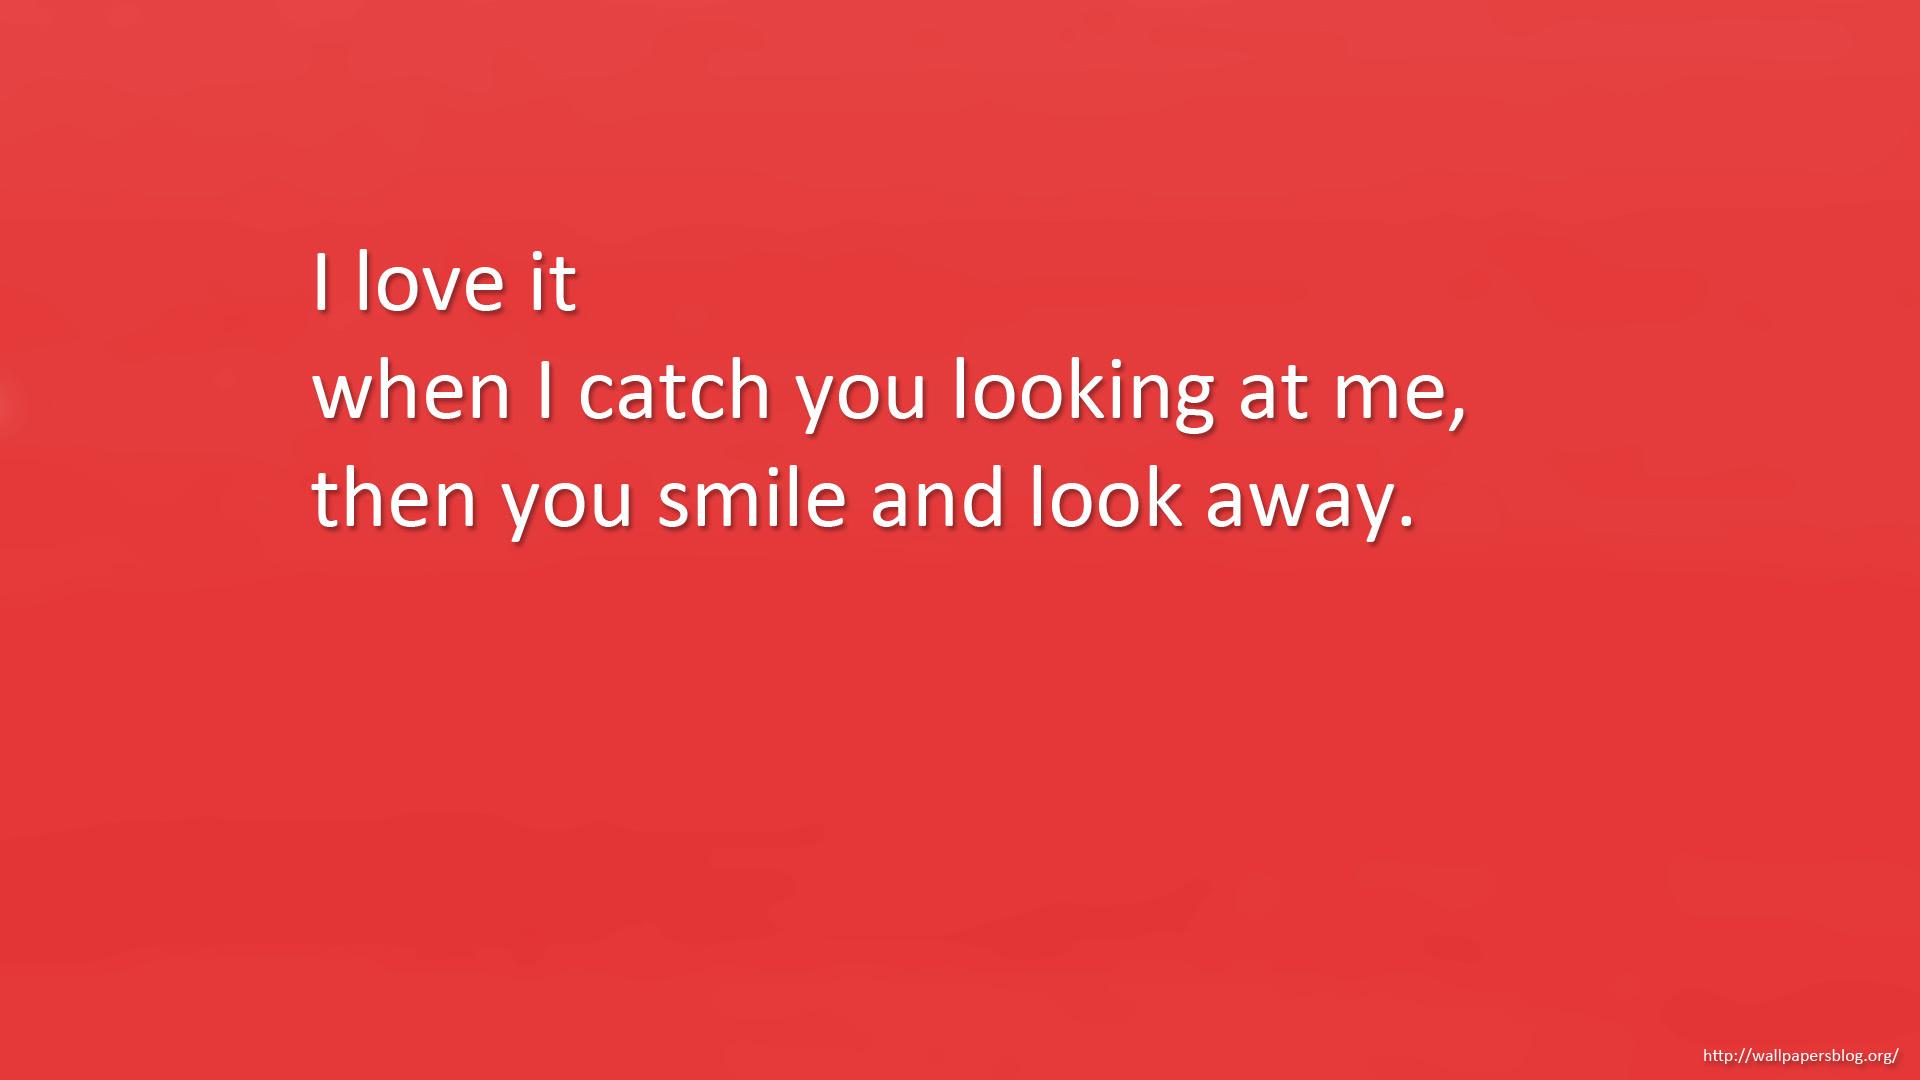 Malayalam Love Quotes Hd Free Download Hd quote wallpaper wallpapersafari